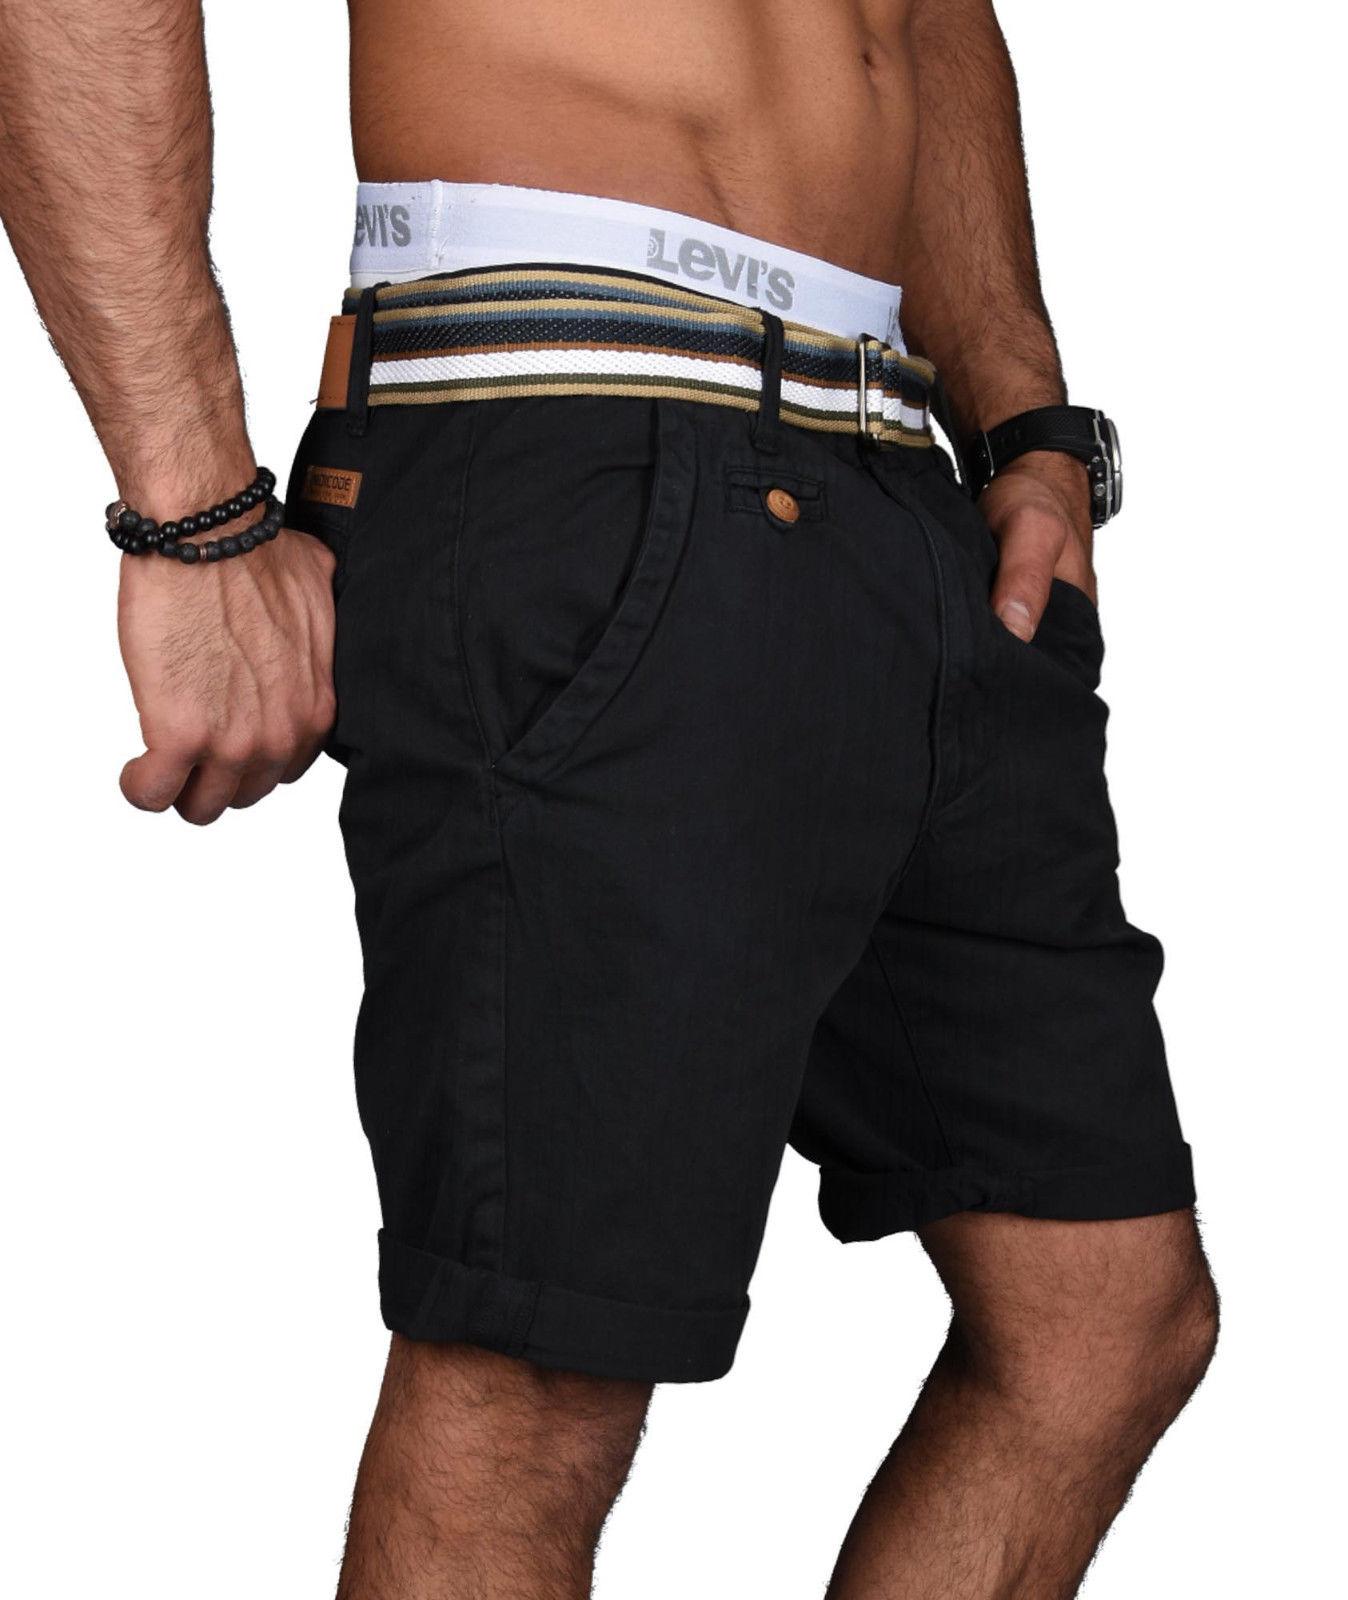 Indicode-Herren-Sommer-Bermuda-Chino-Shorts-kurze-Hose-Sommerhose-Short-NEU-B499 Indexbild 27